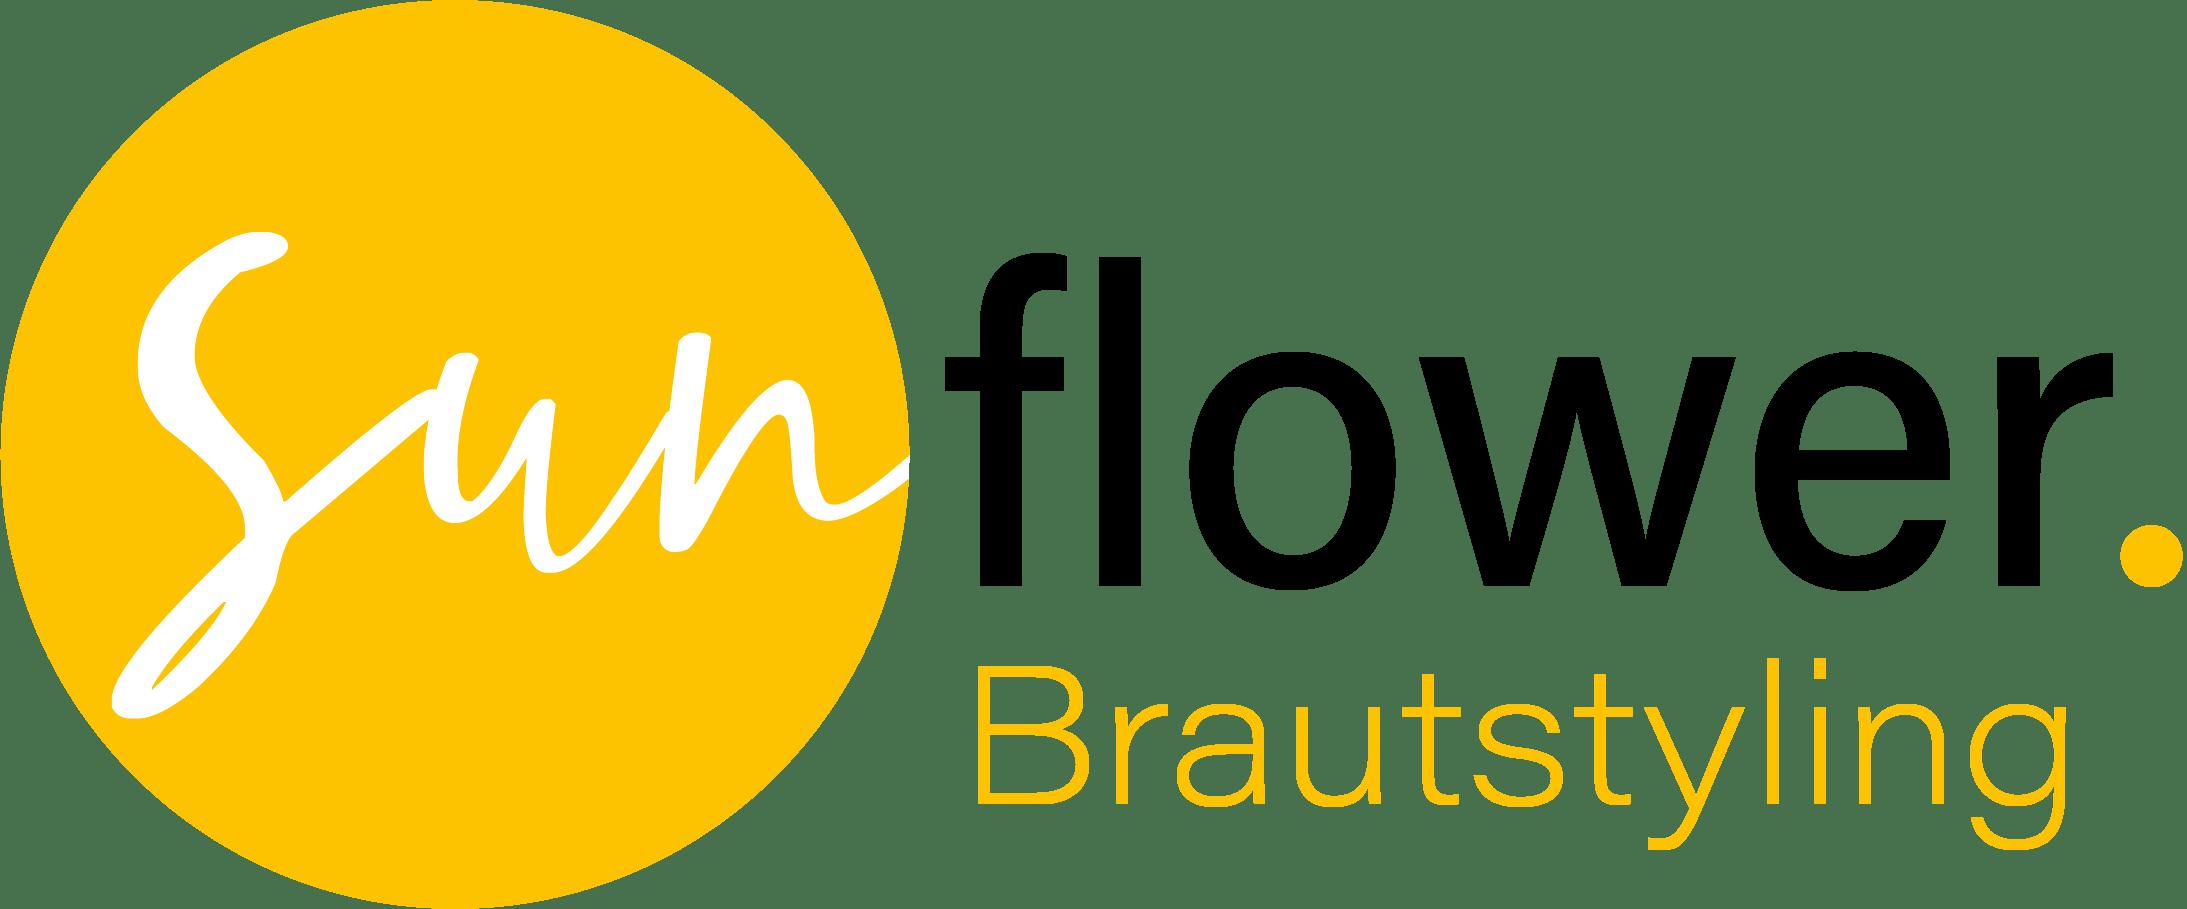 Brautstyling Südtirol